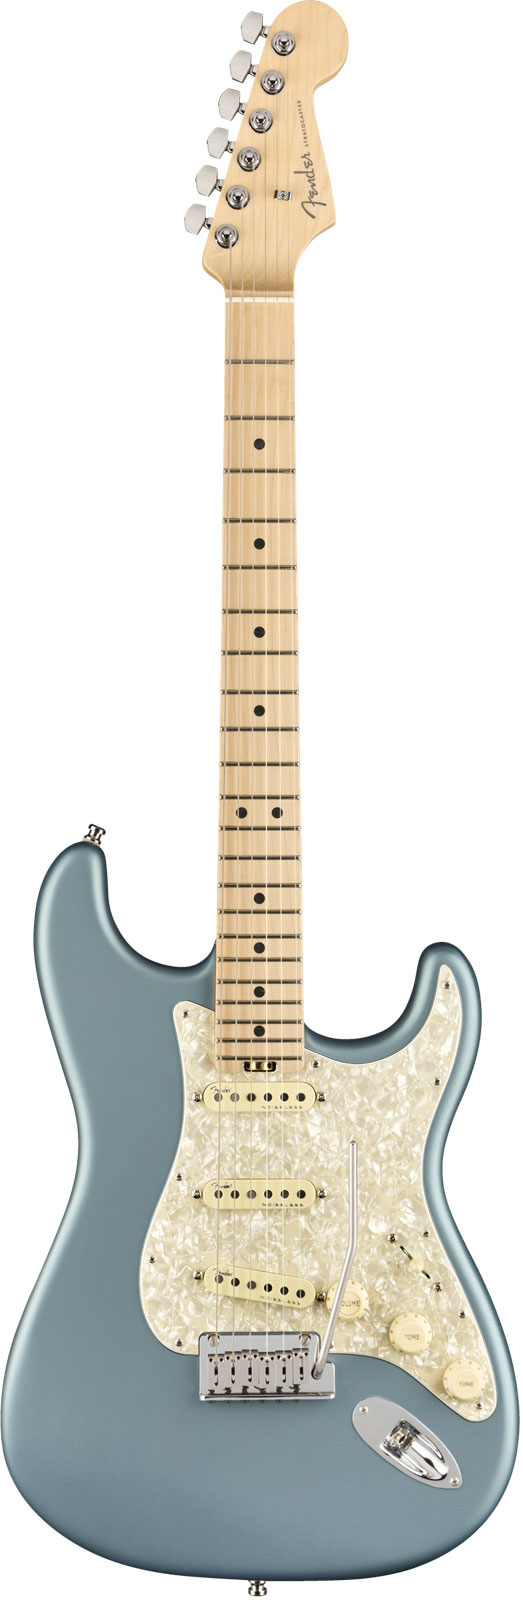 Fender American Elite Stratocaster Mn Satin Ice Blue Metallic